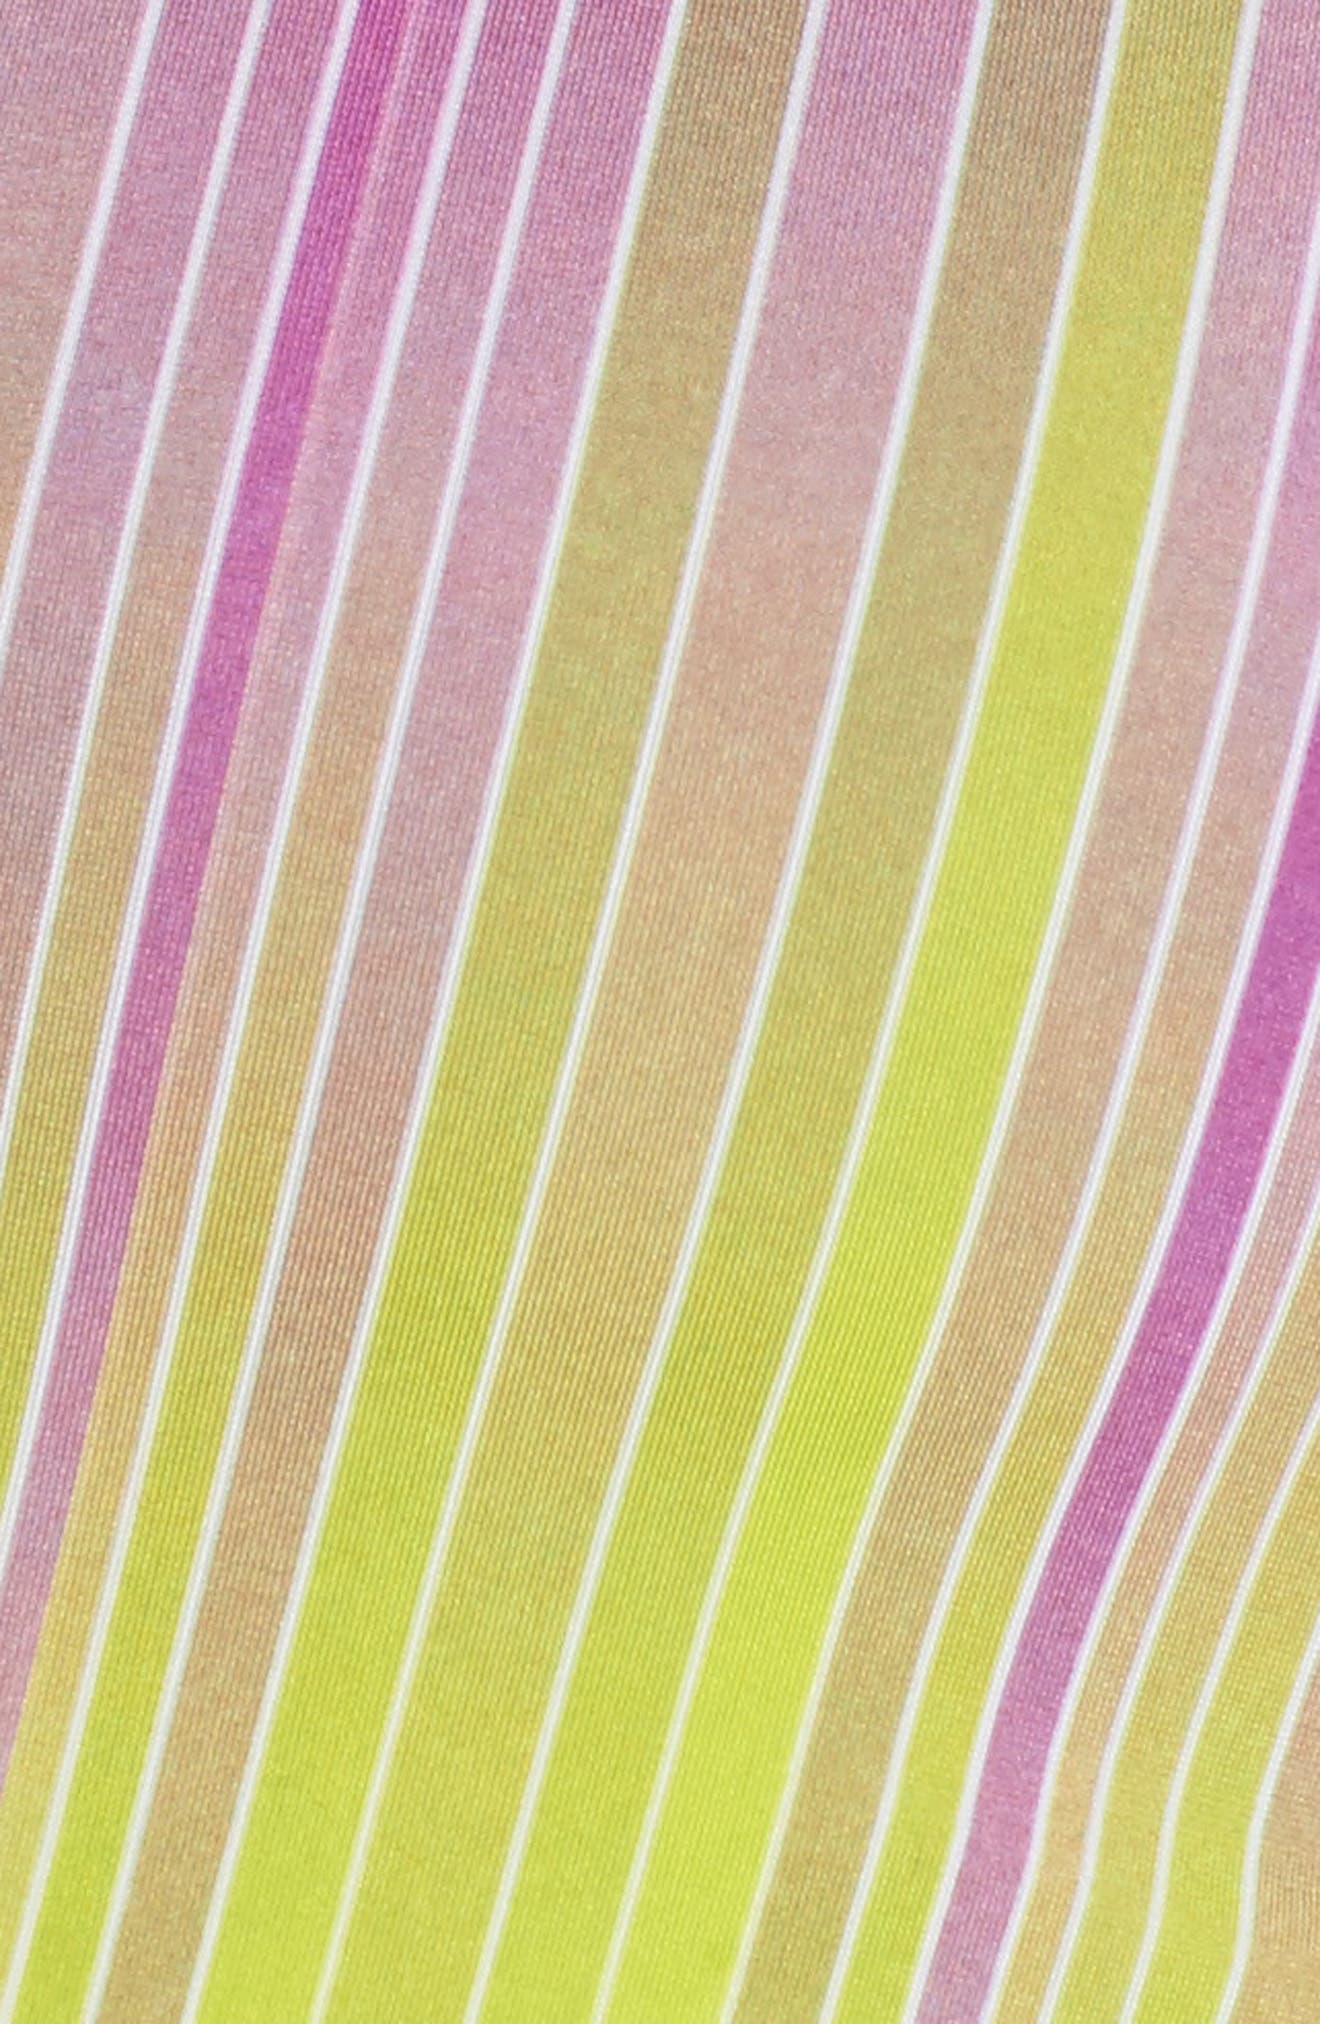 Graphic X Sports Bra,                             Alternate thumbnail 6, color,                             Pinstripes